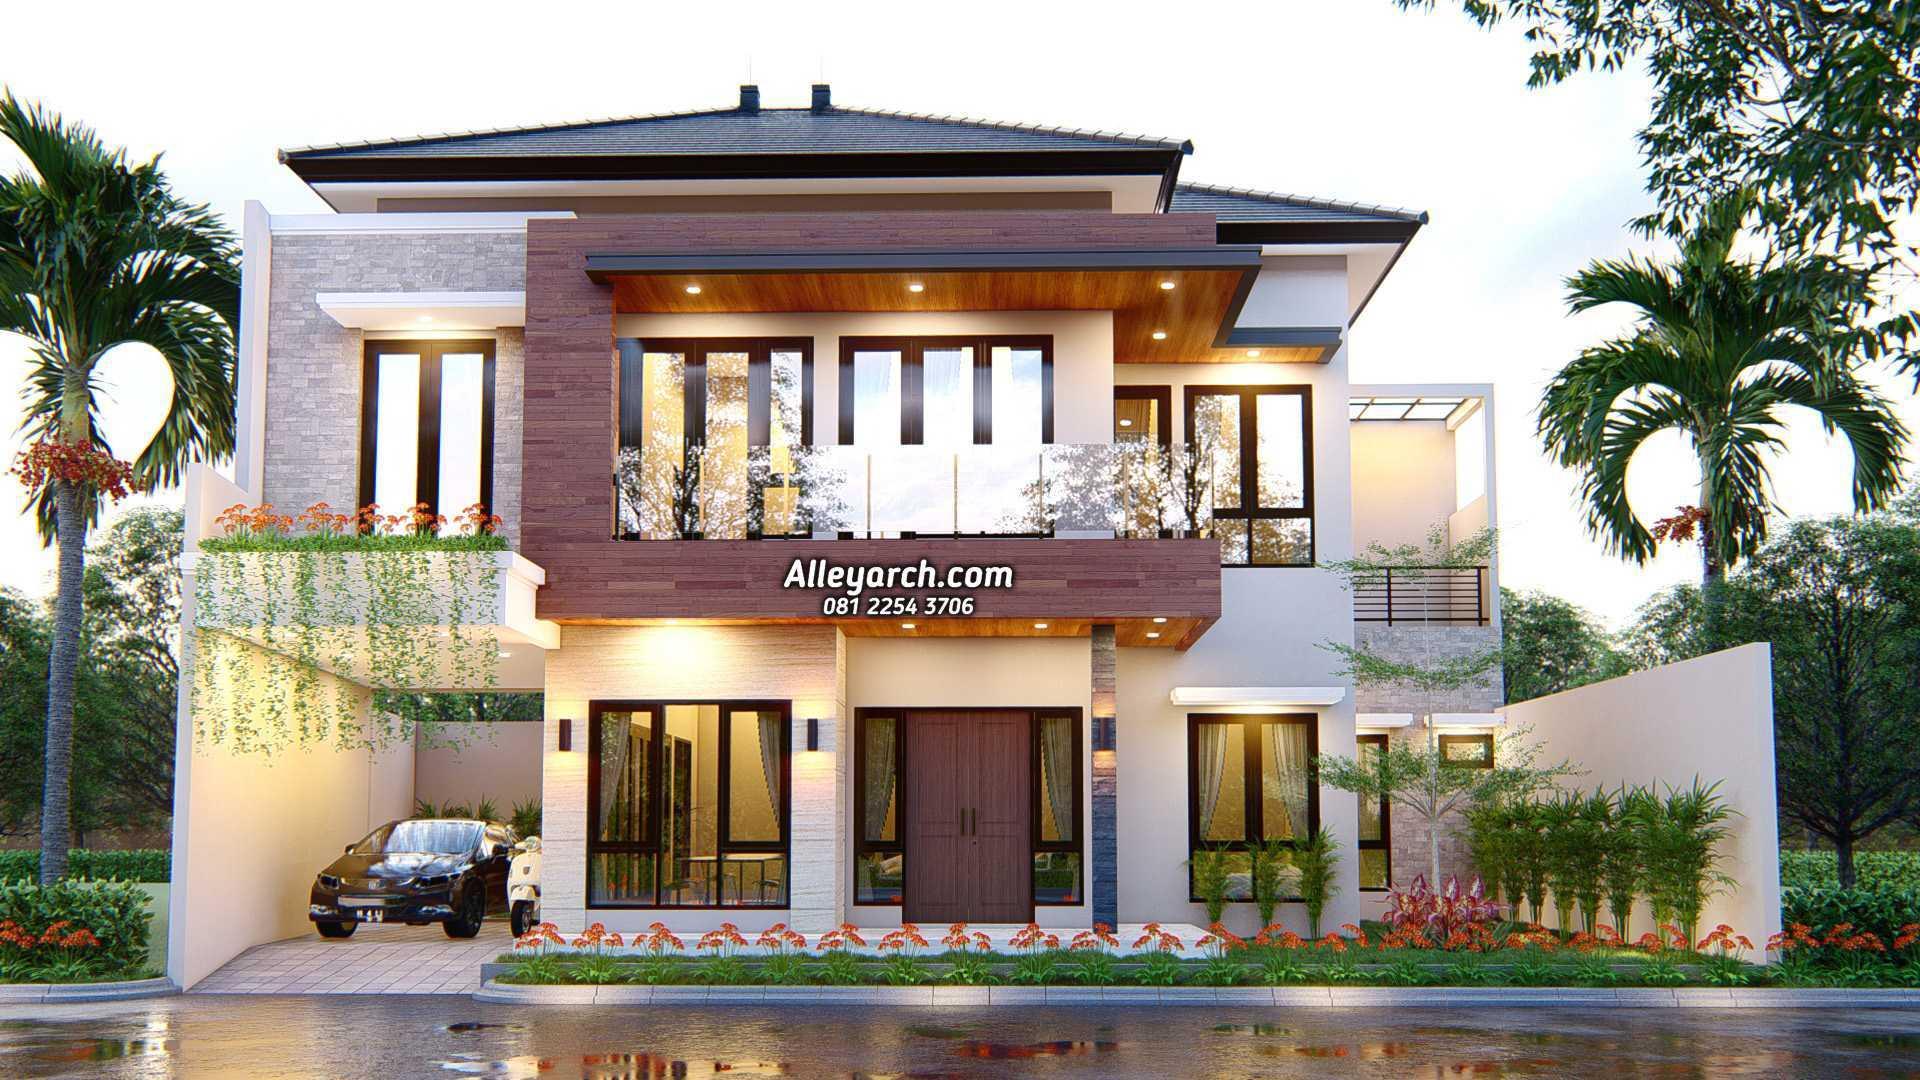 Jasa Arsitek Alleyarch di Jayapura